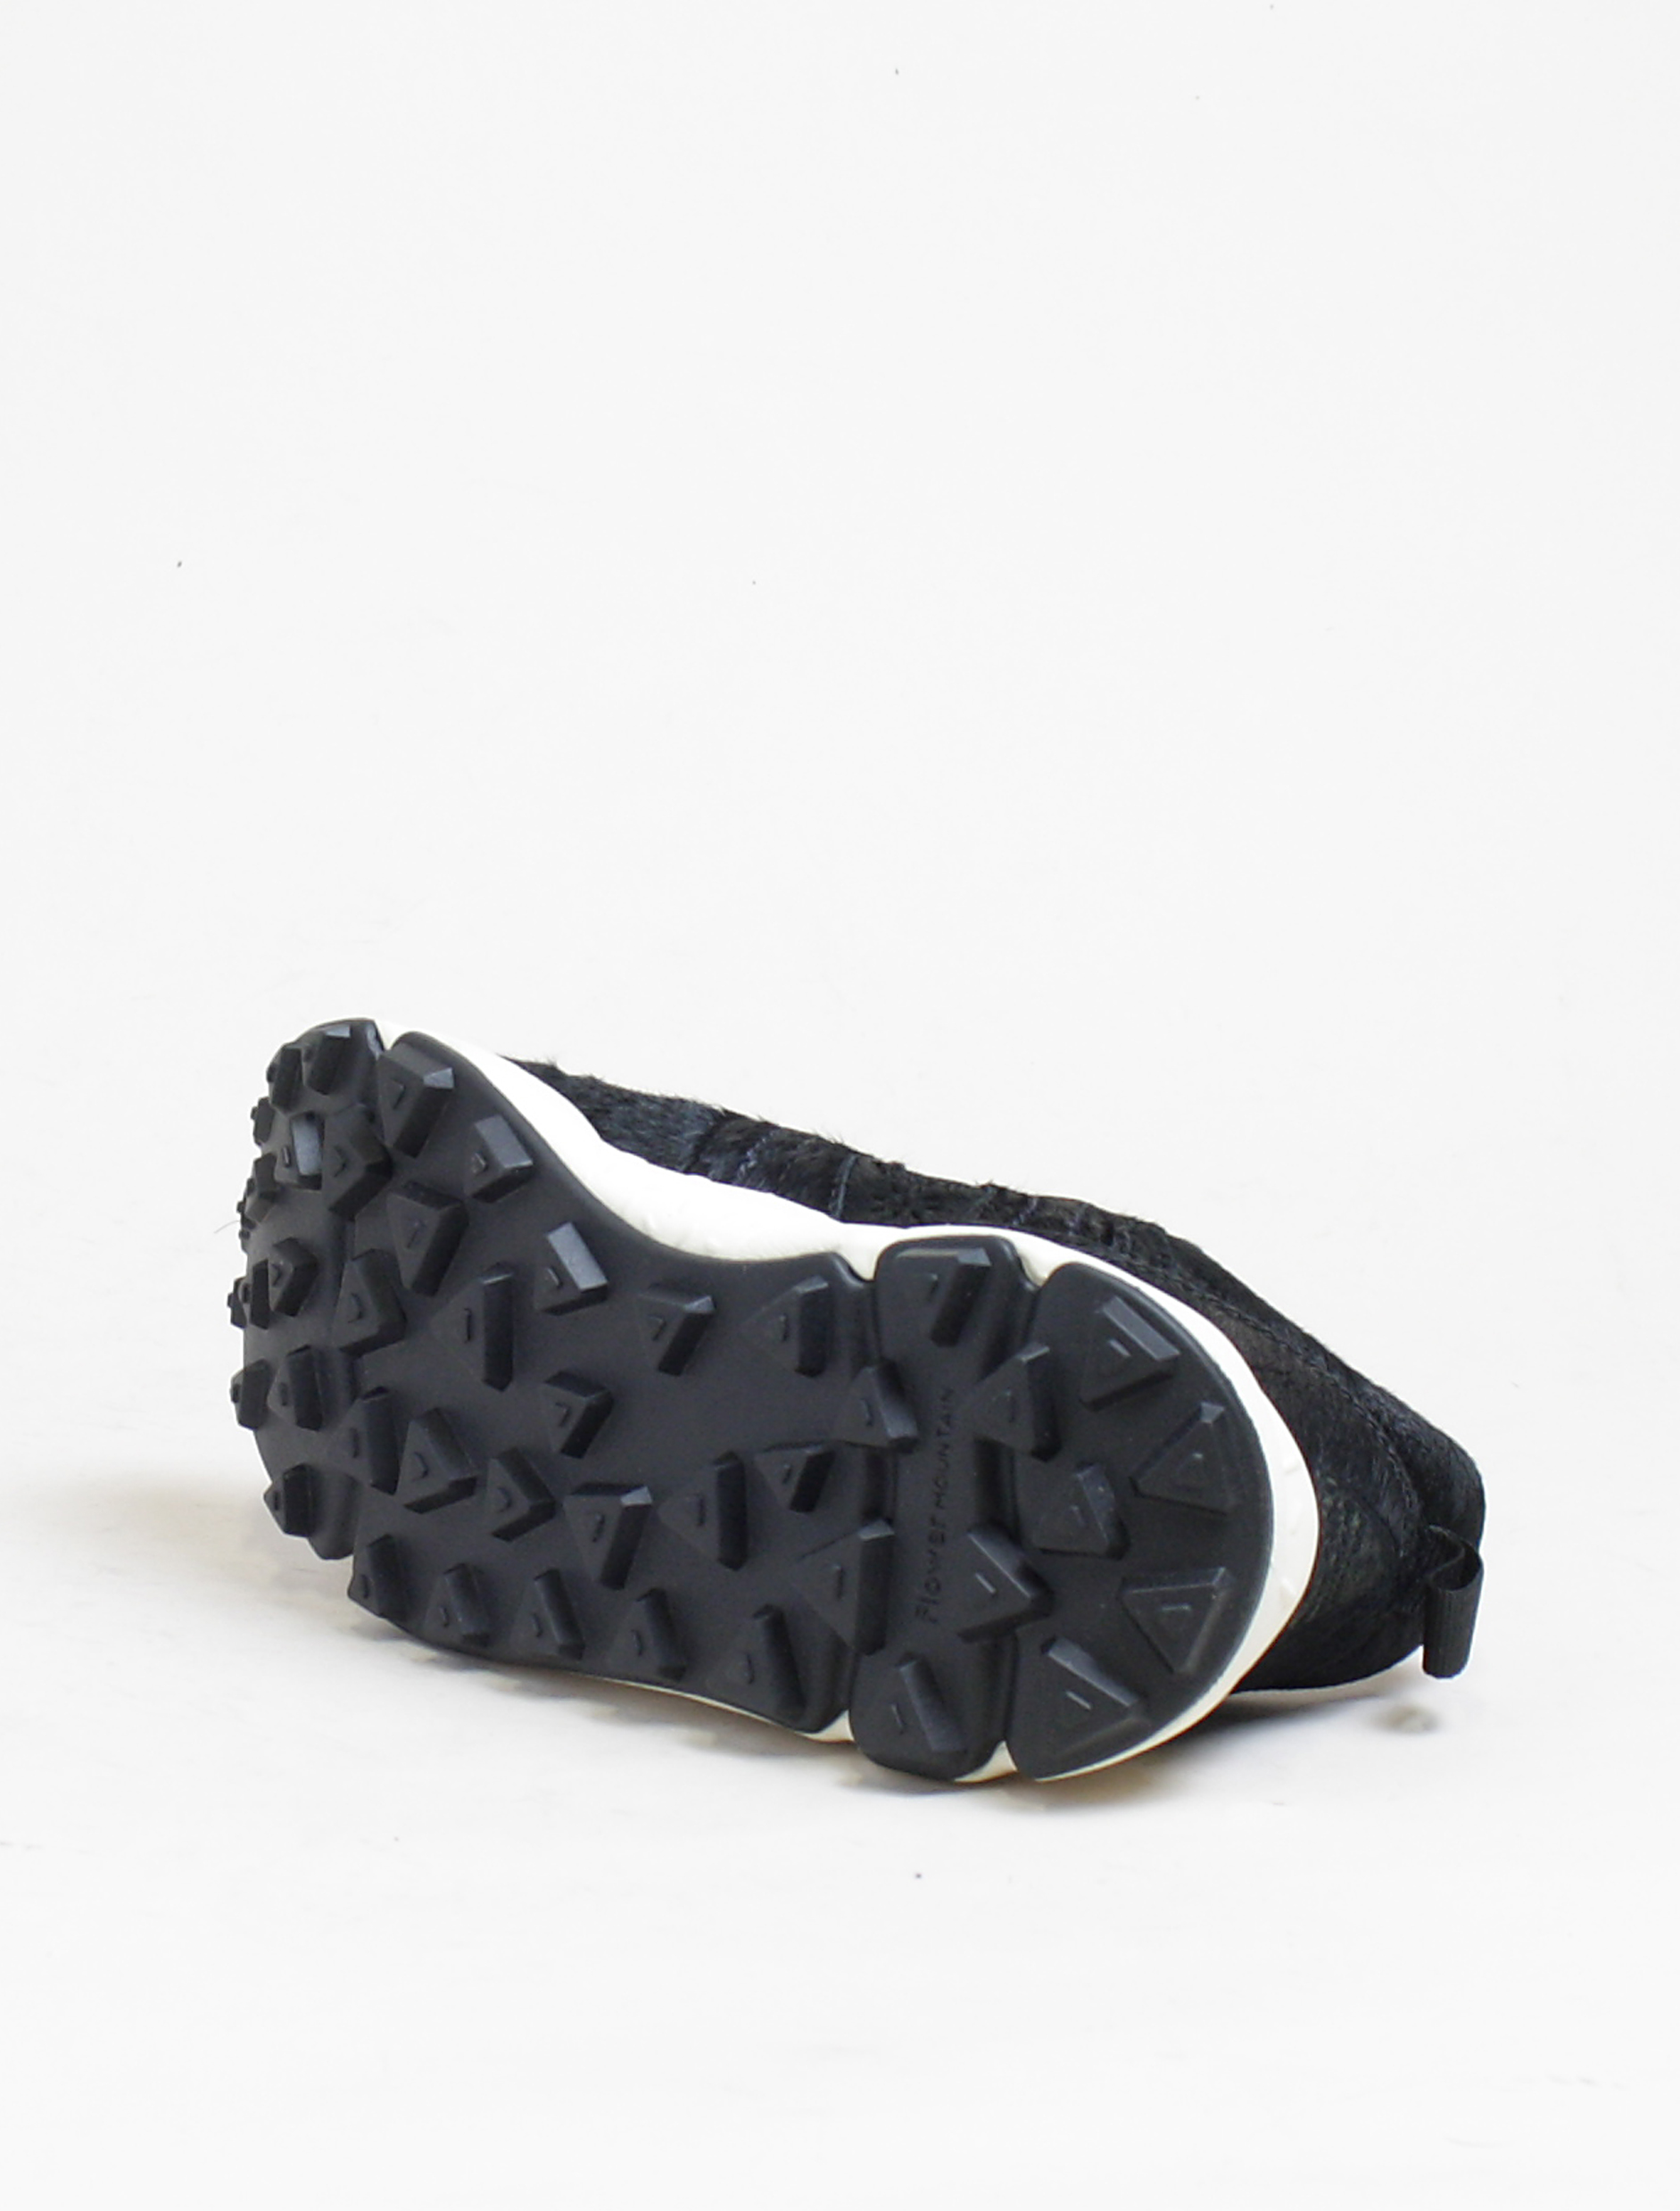 Flower Mountain sneakers Corax 2 horse hair black suola